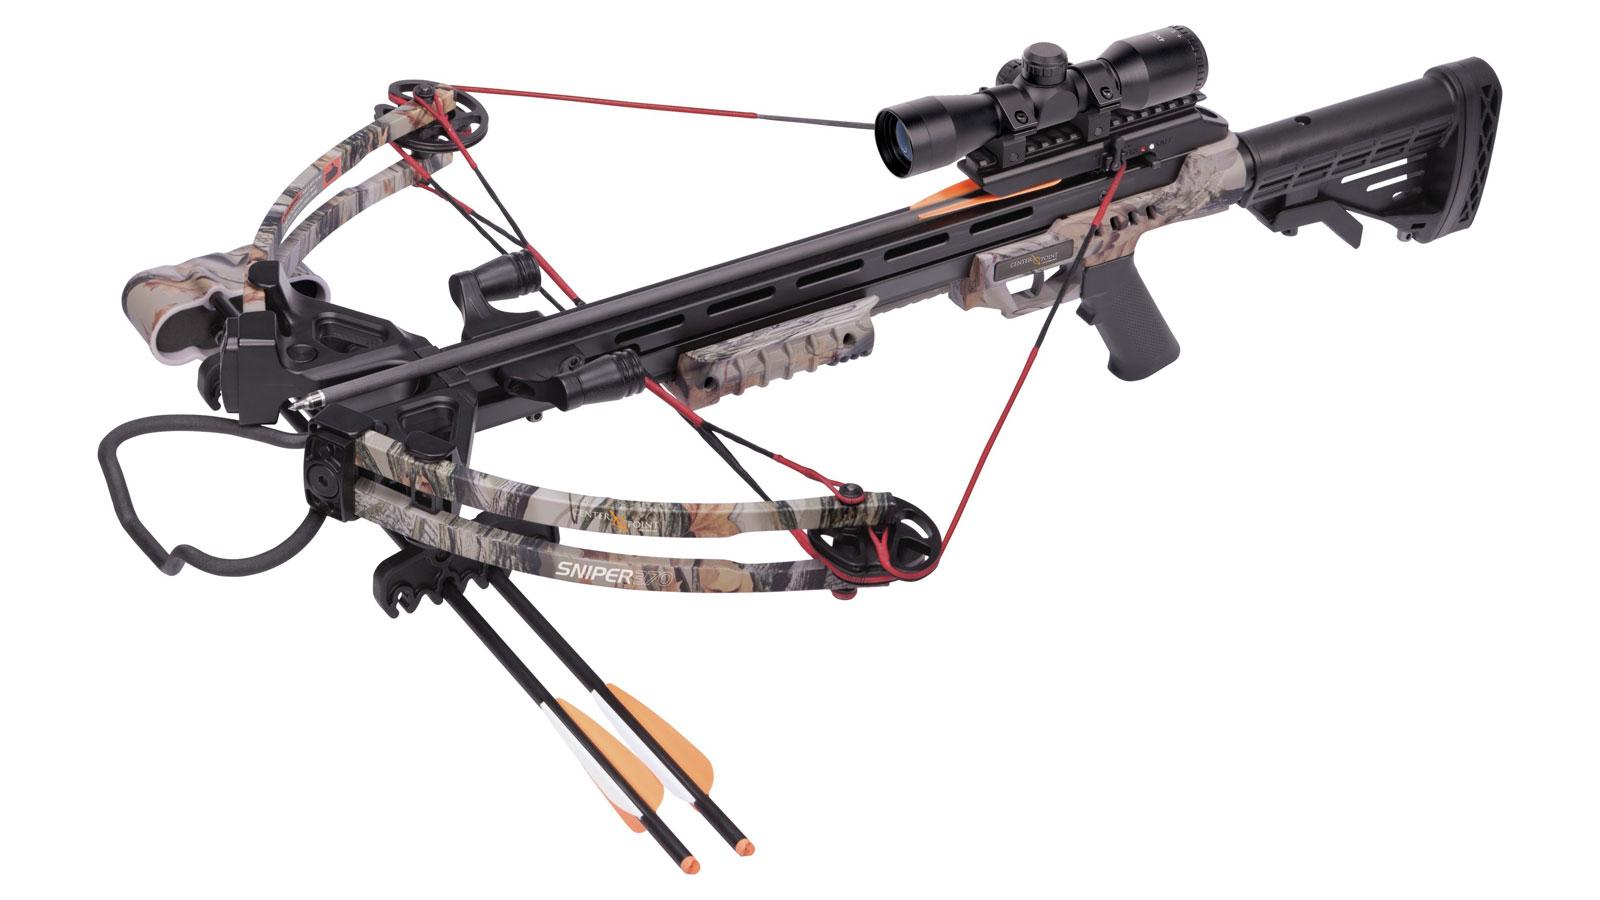 Benjamin Mayhem Nitro Piston 2 SBD Air Rifle Black Crosman BMN2Q2SX